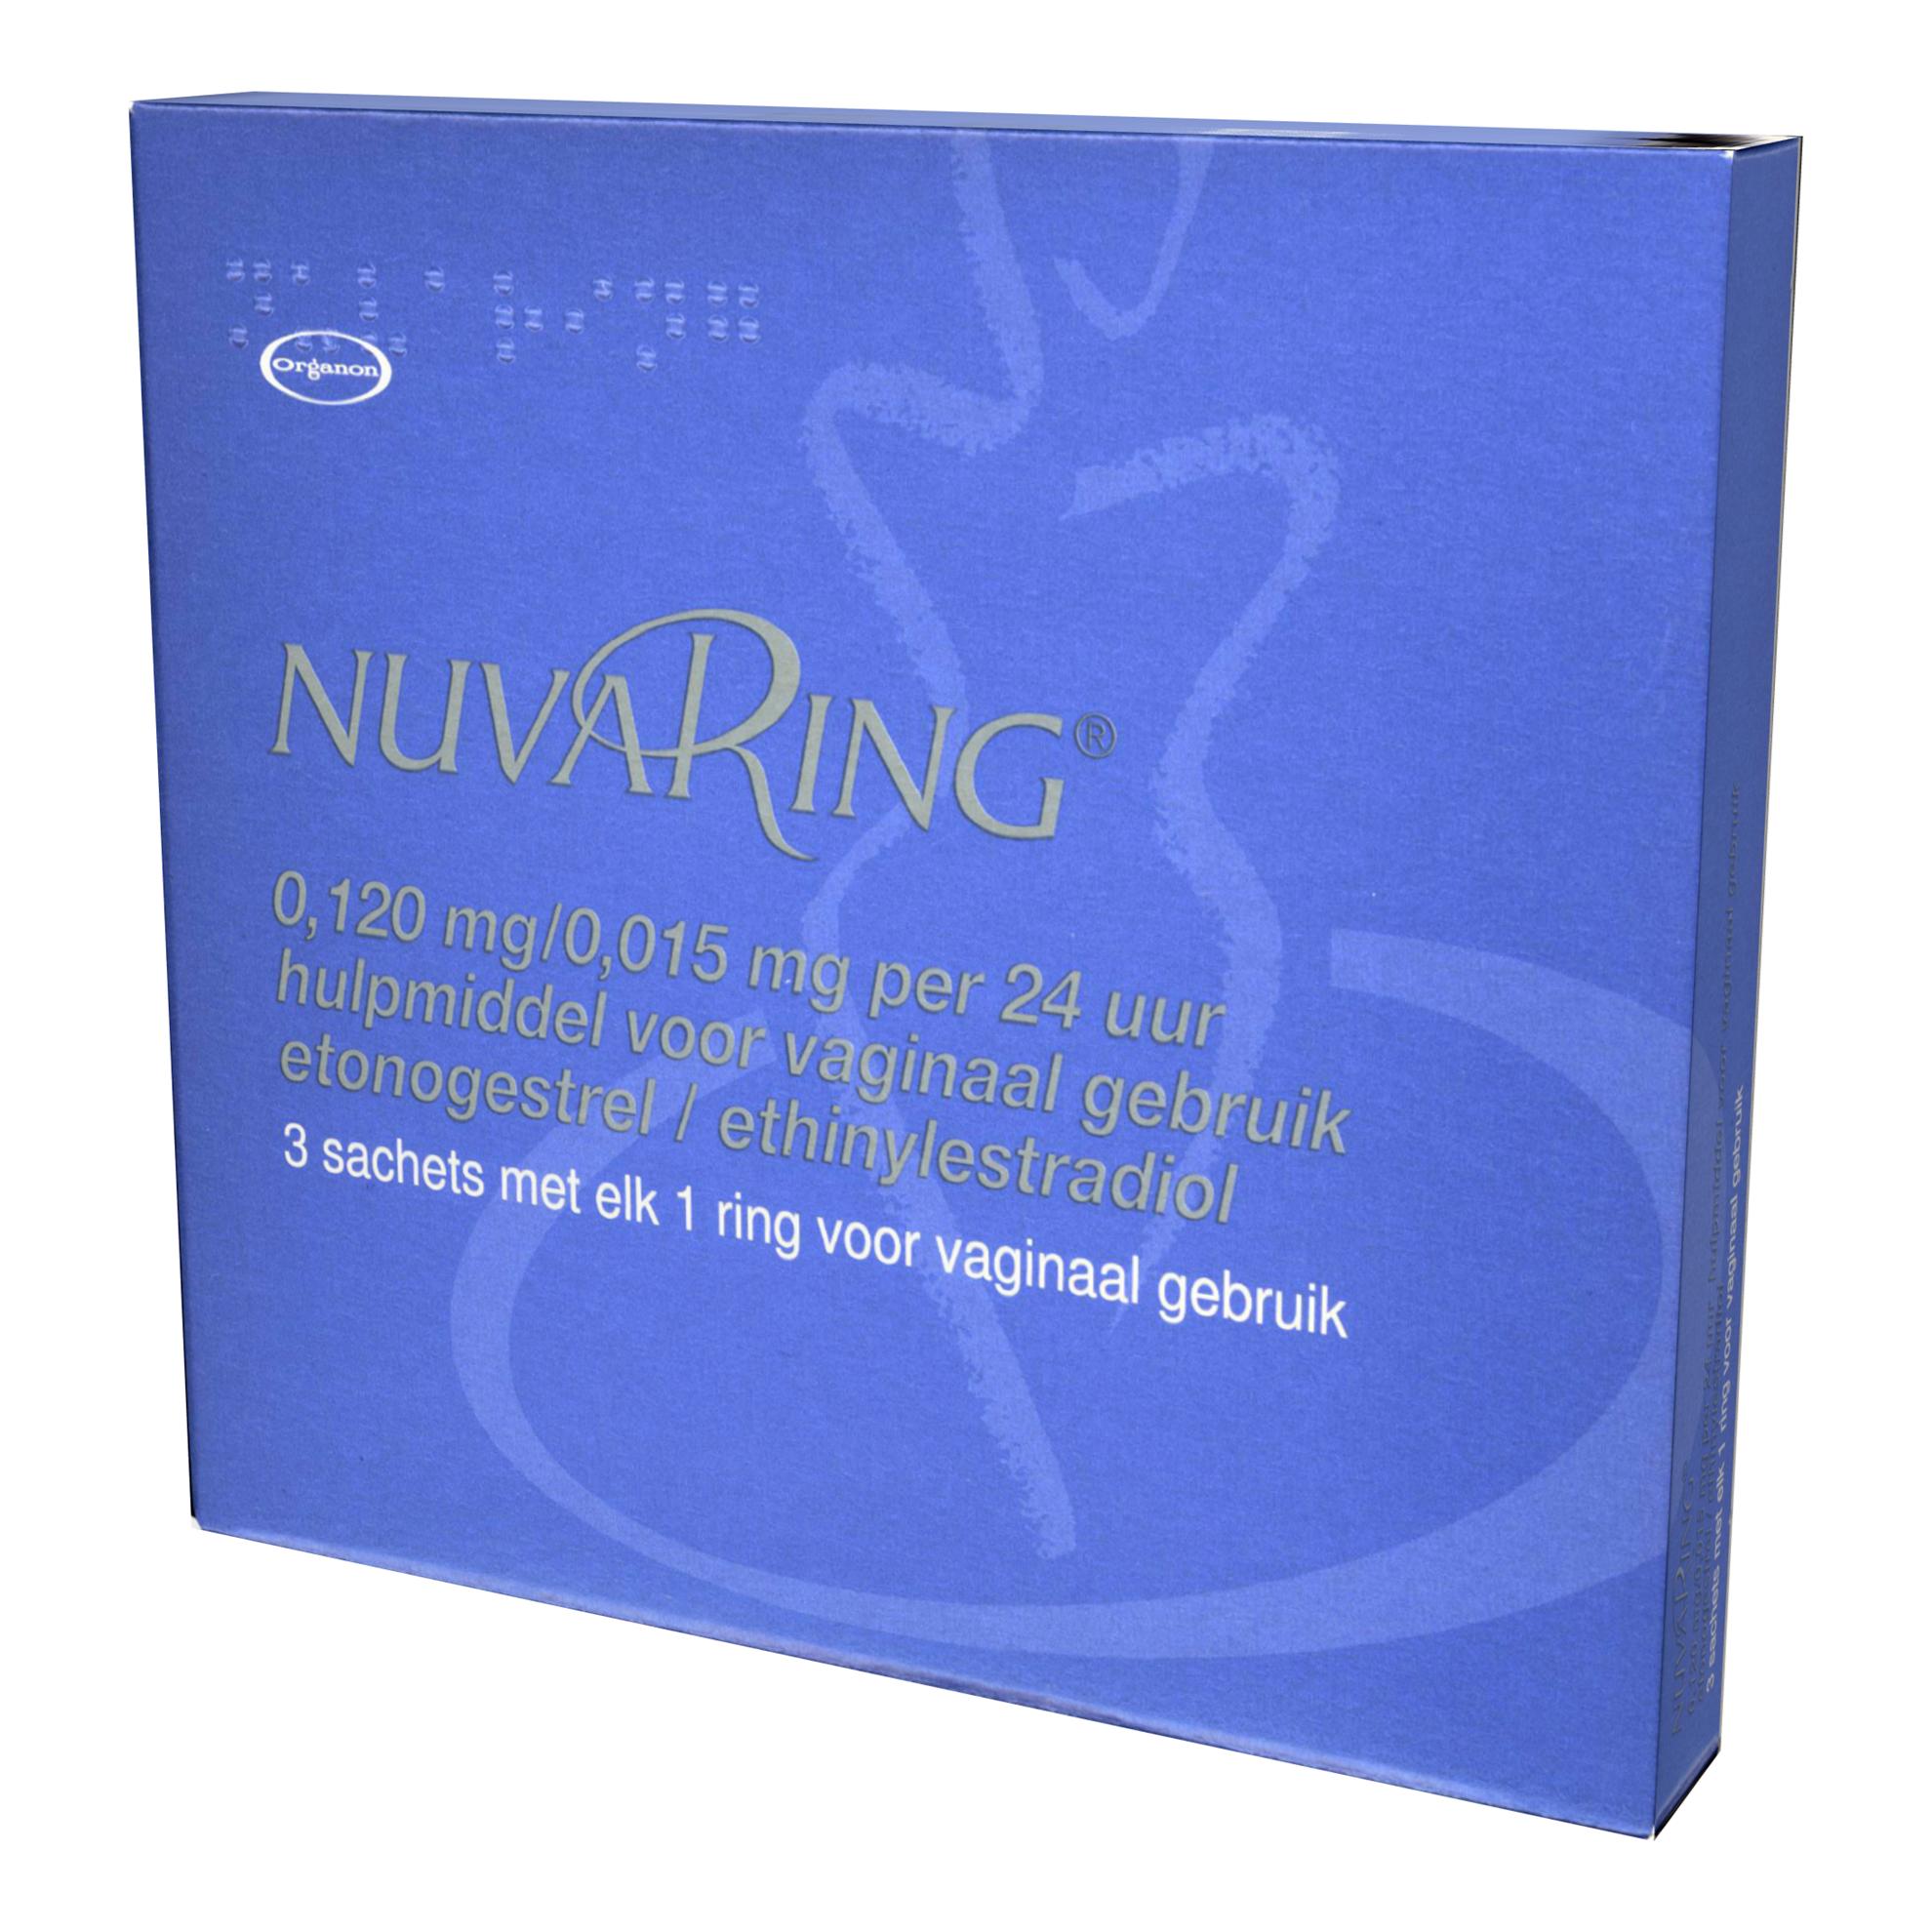 Nuvaring günstig online bestellen bei PilleAbo.de